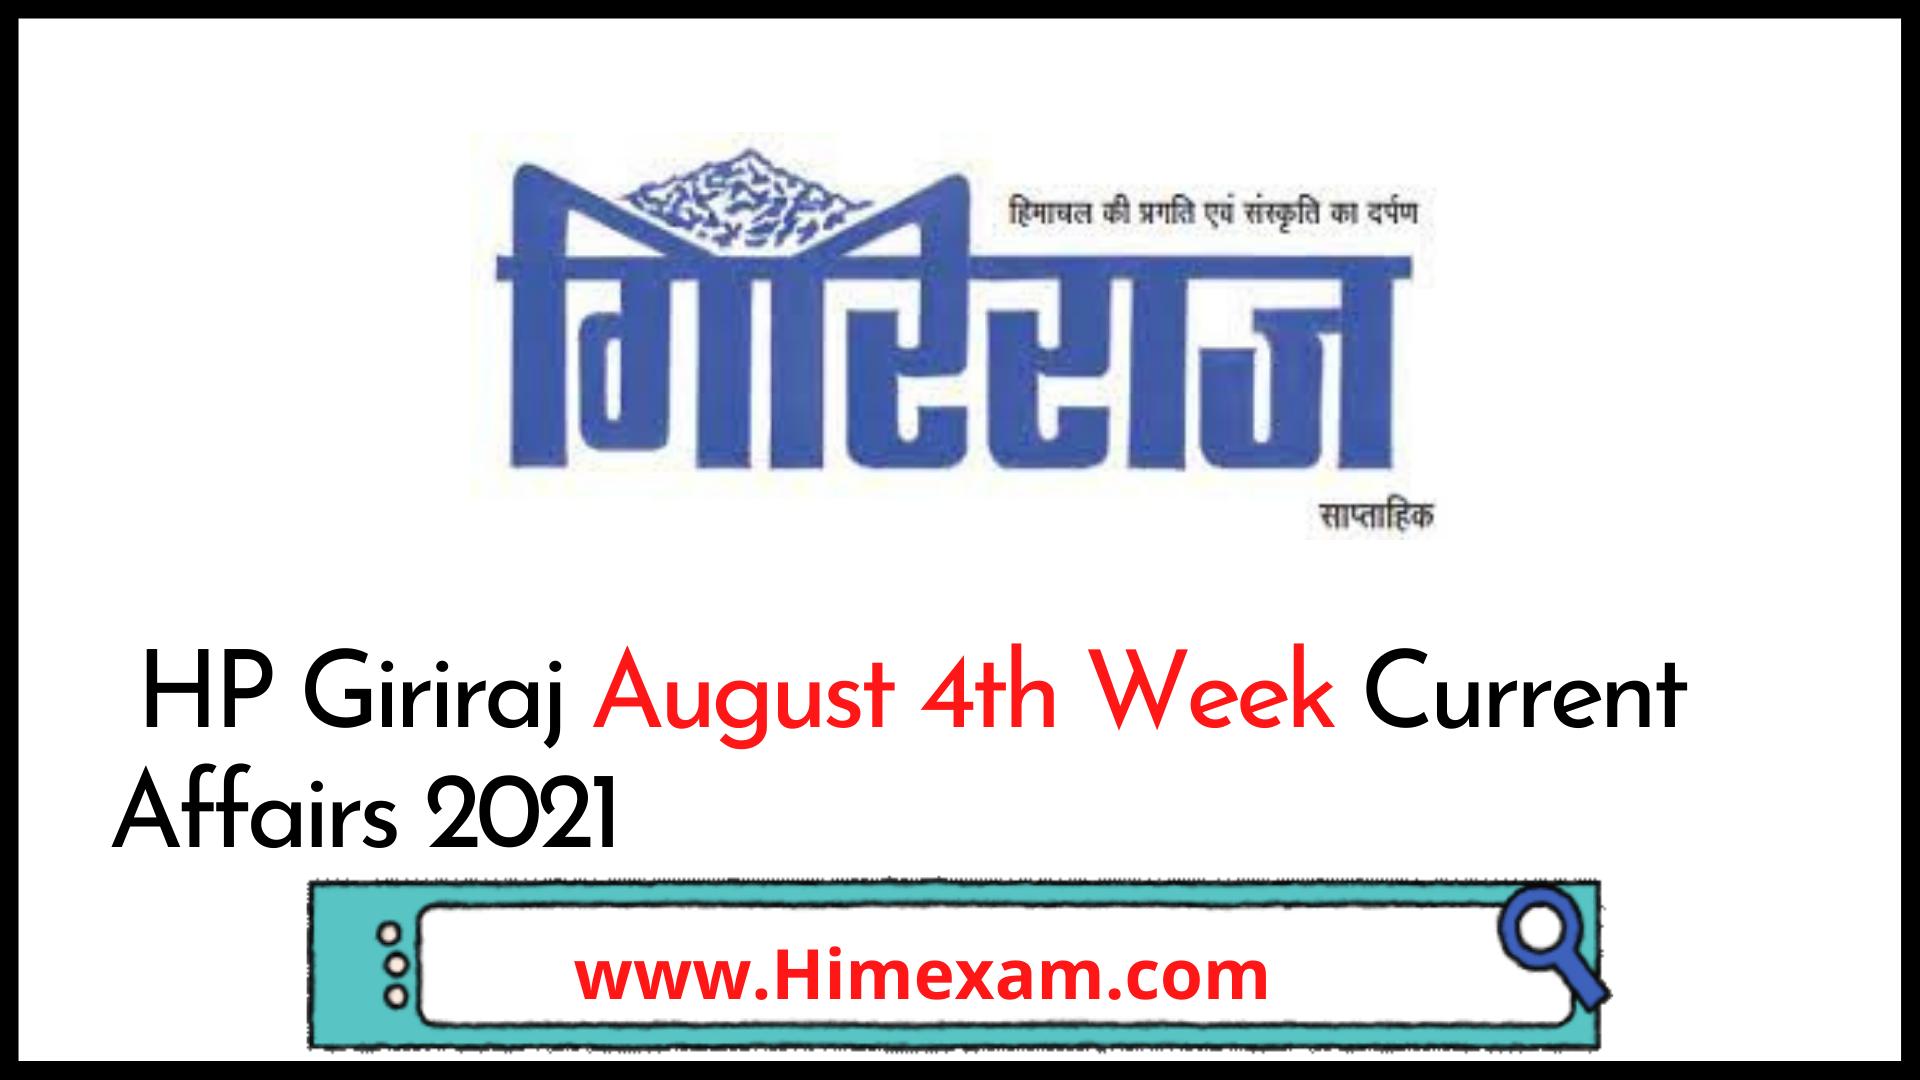 HP Giriraj August 4th Week Current Affairs 2021